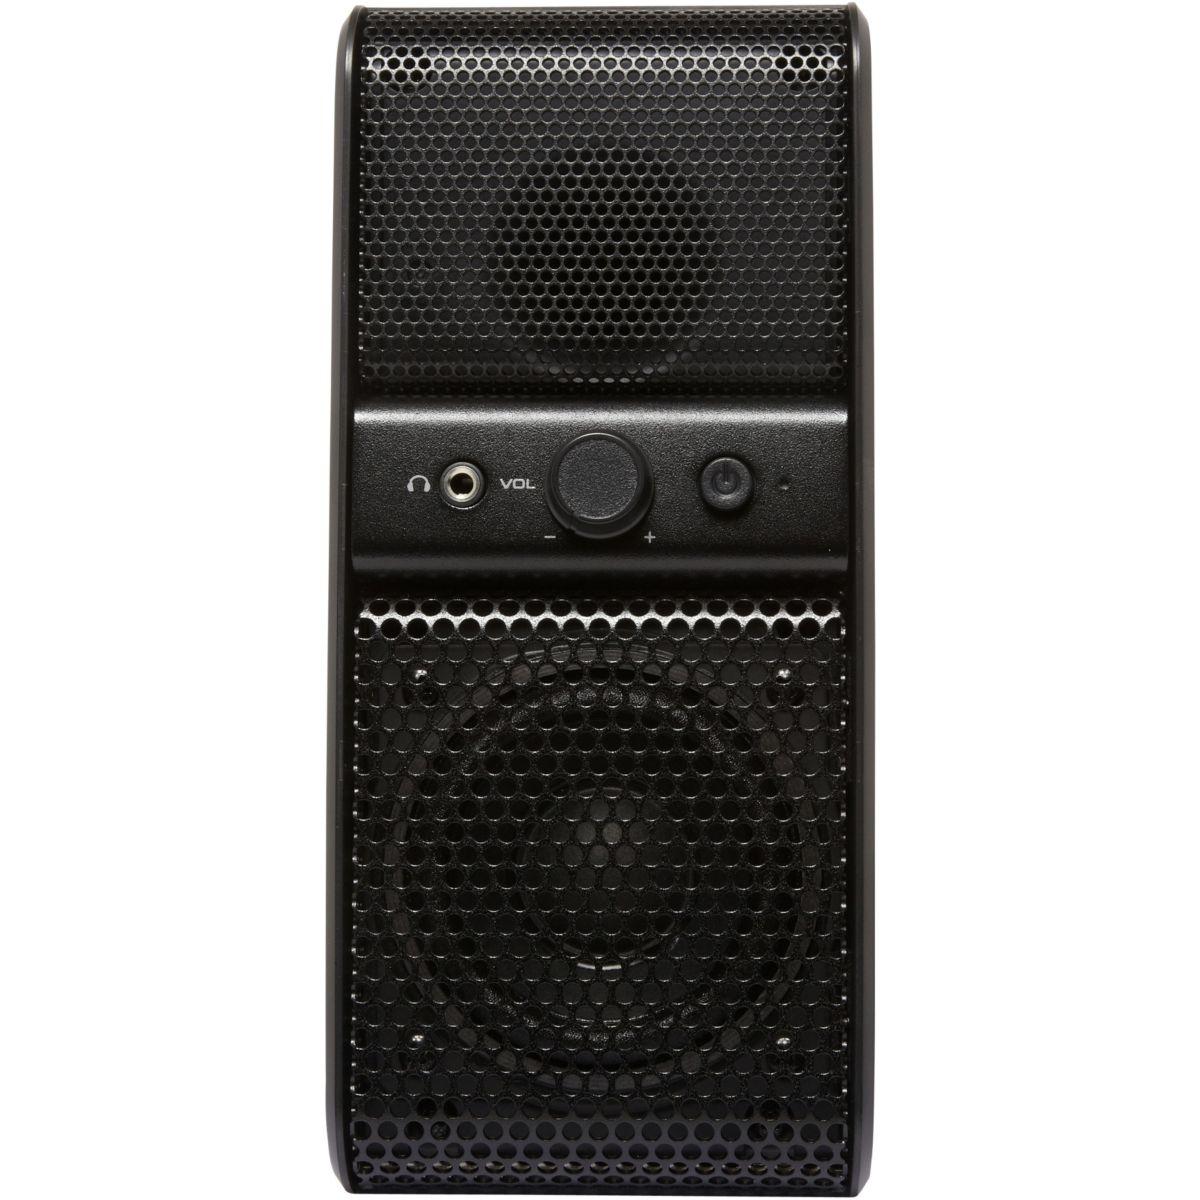 Enceinte tv yamaha nx50 noir - livraison offerte : code livrel...